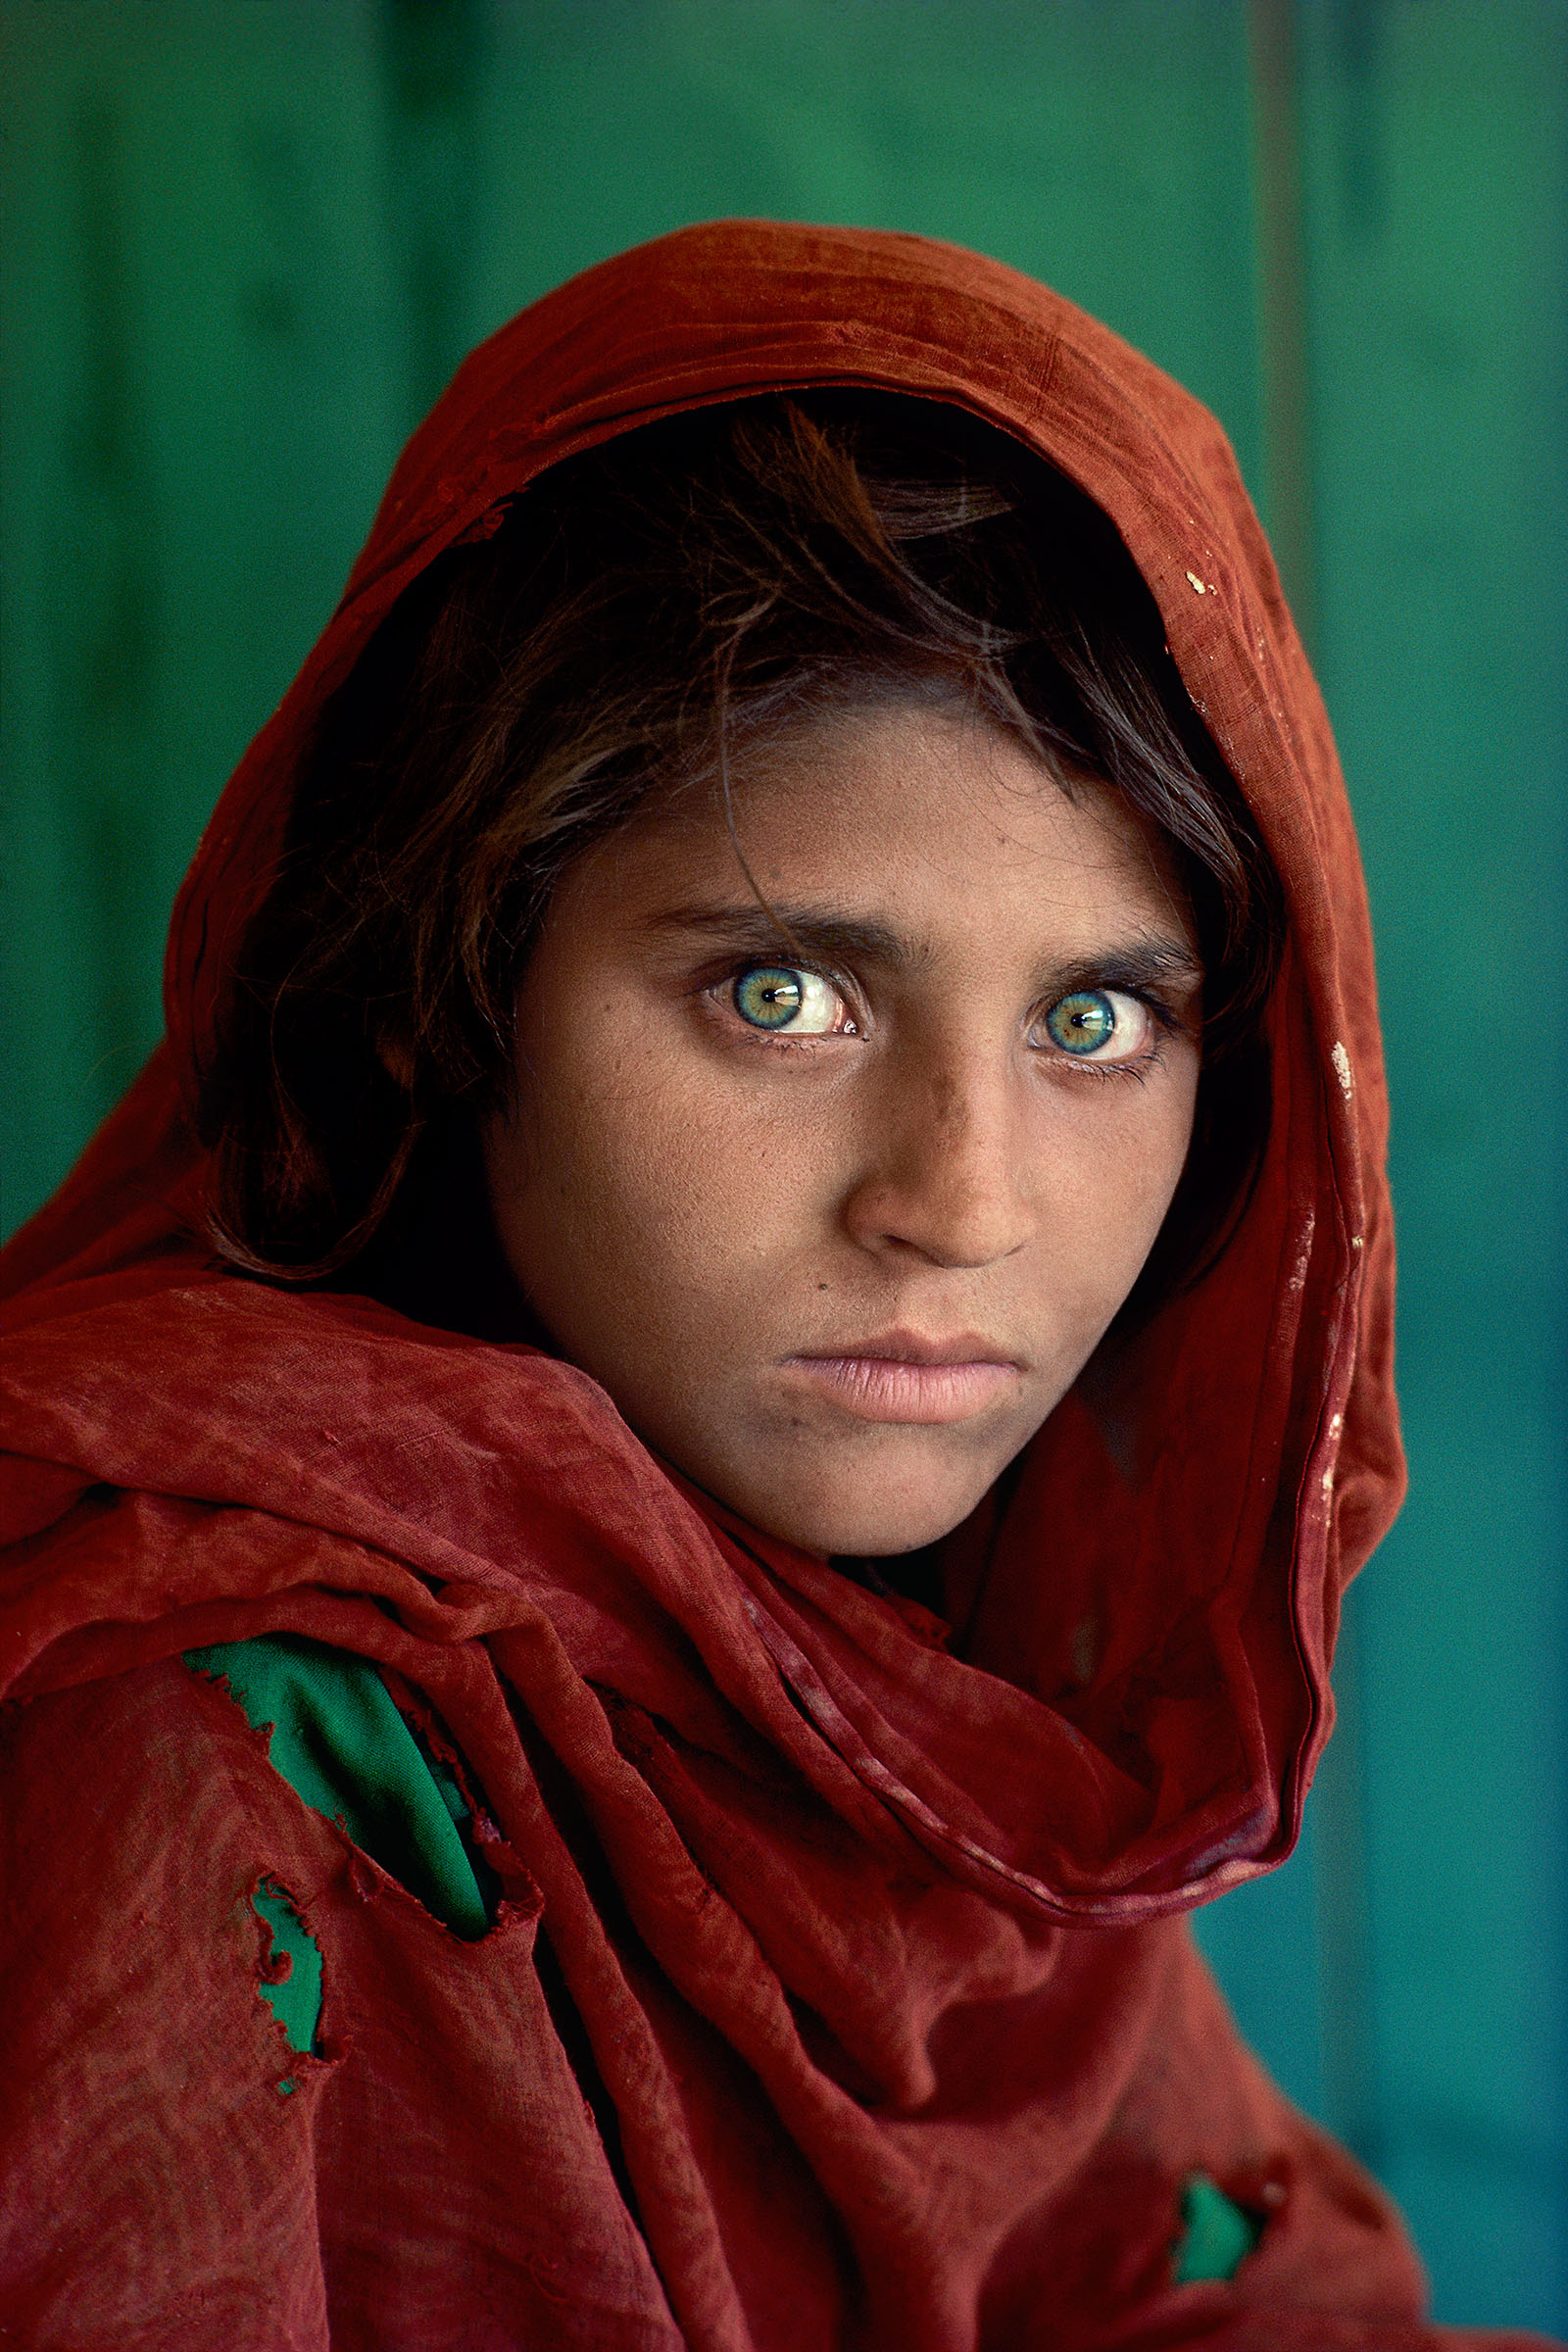 Steve McCurry, Peshawar, Pakistan, 1984 © Steve McCurry